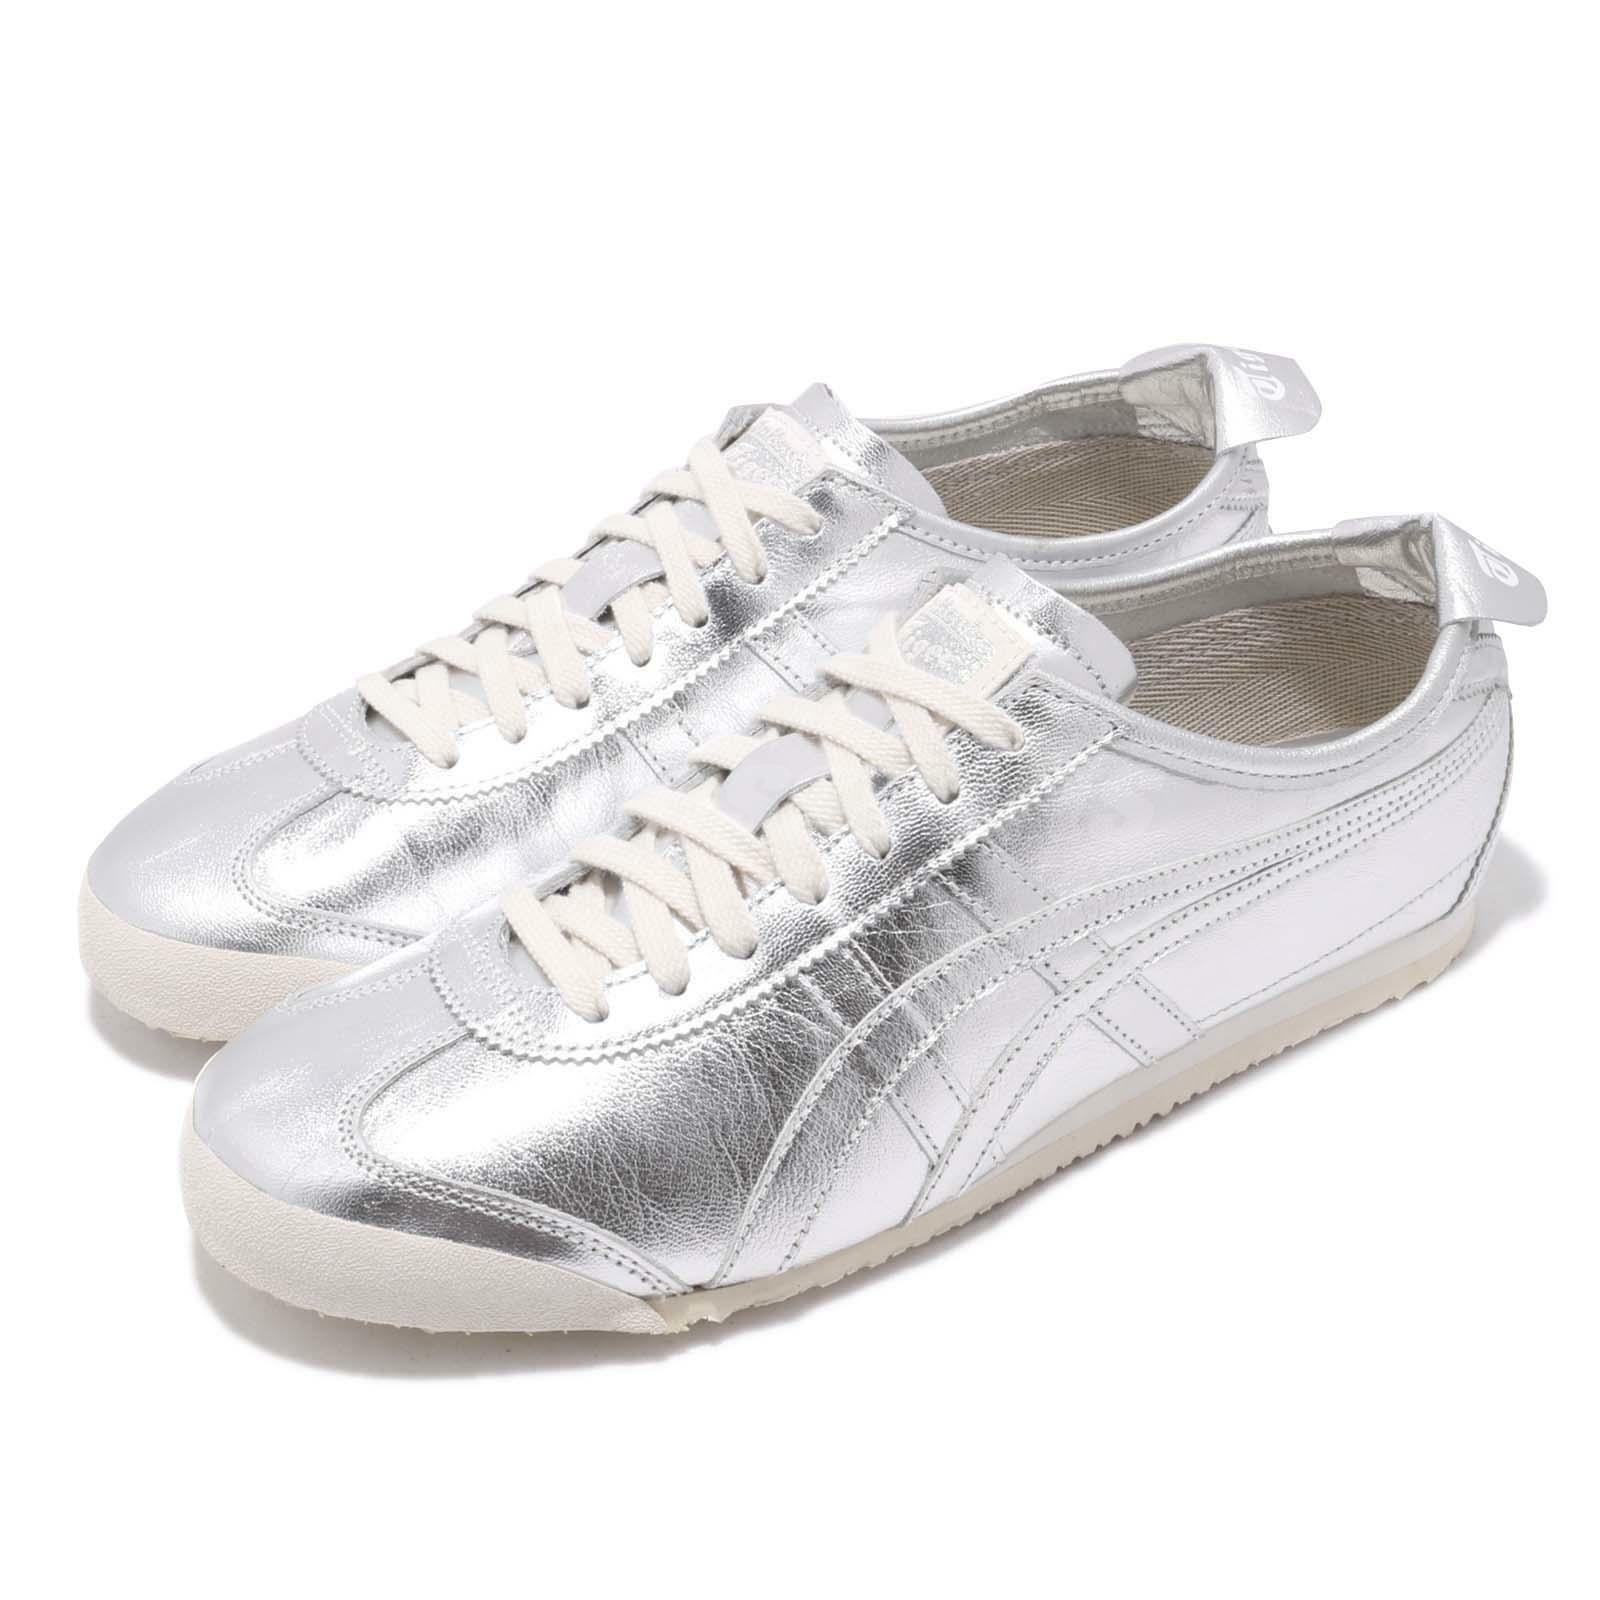 Asics Onitsuka Tiger Mexico 66 plateados para Hombre Running Zapatos TENIS D6G1L-9393